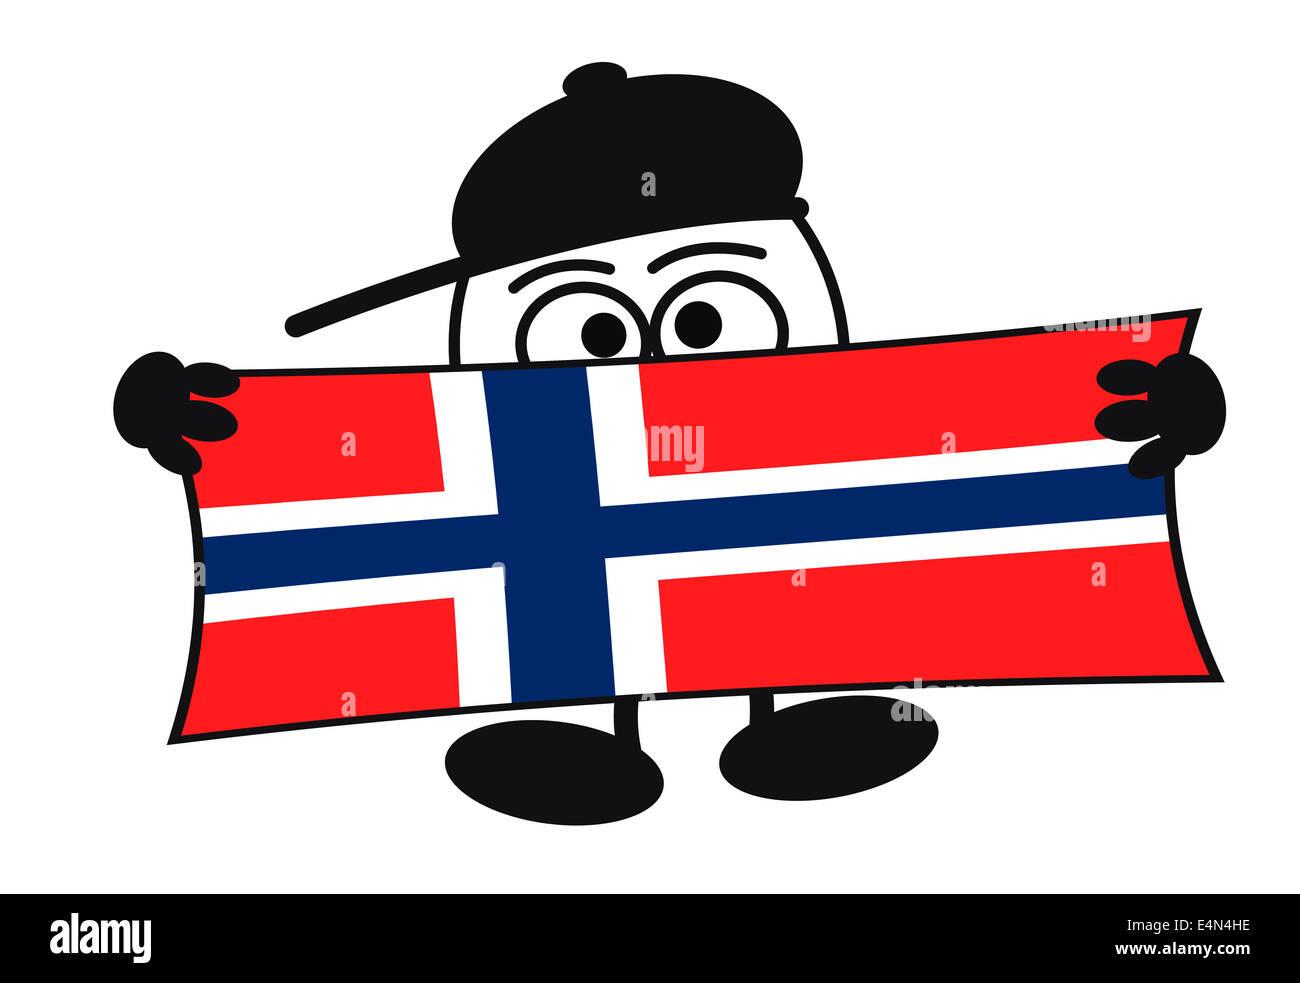 Eierkopf - Welcome Norway Stock Photo